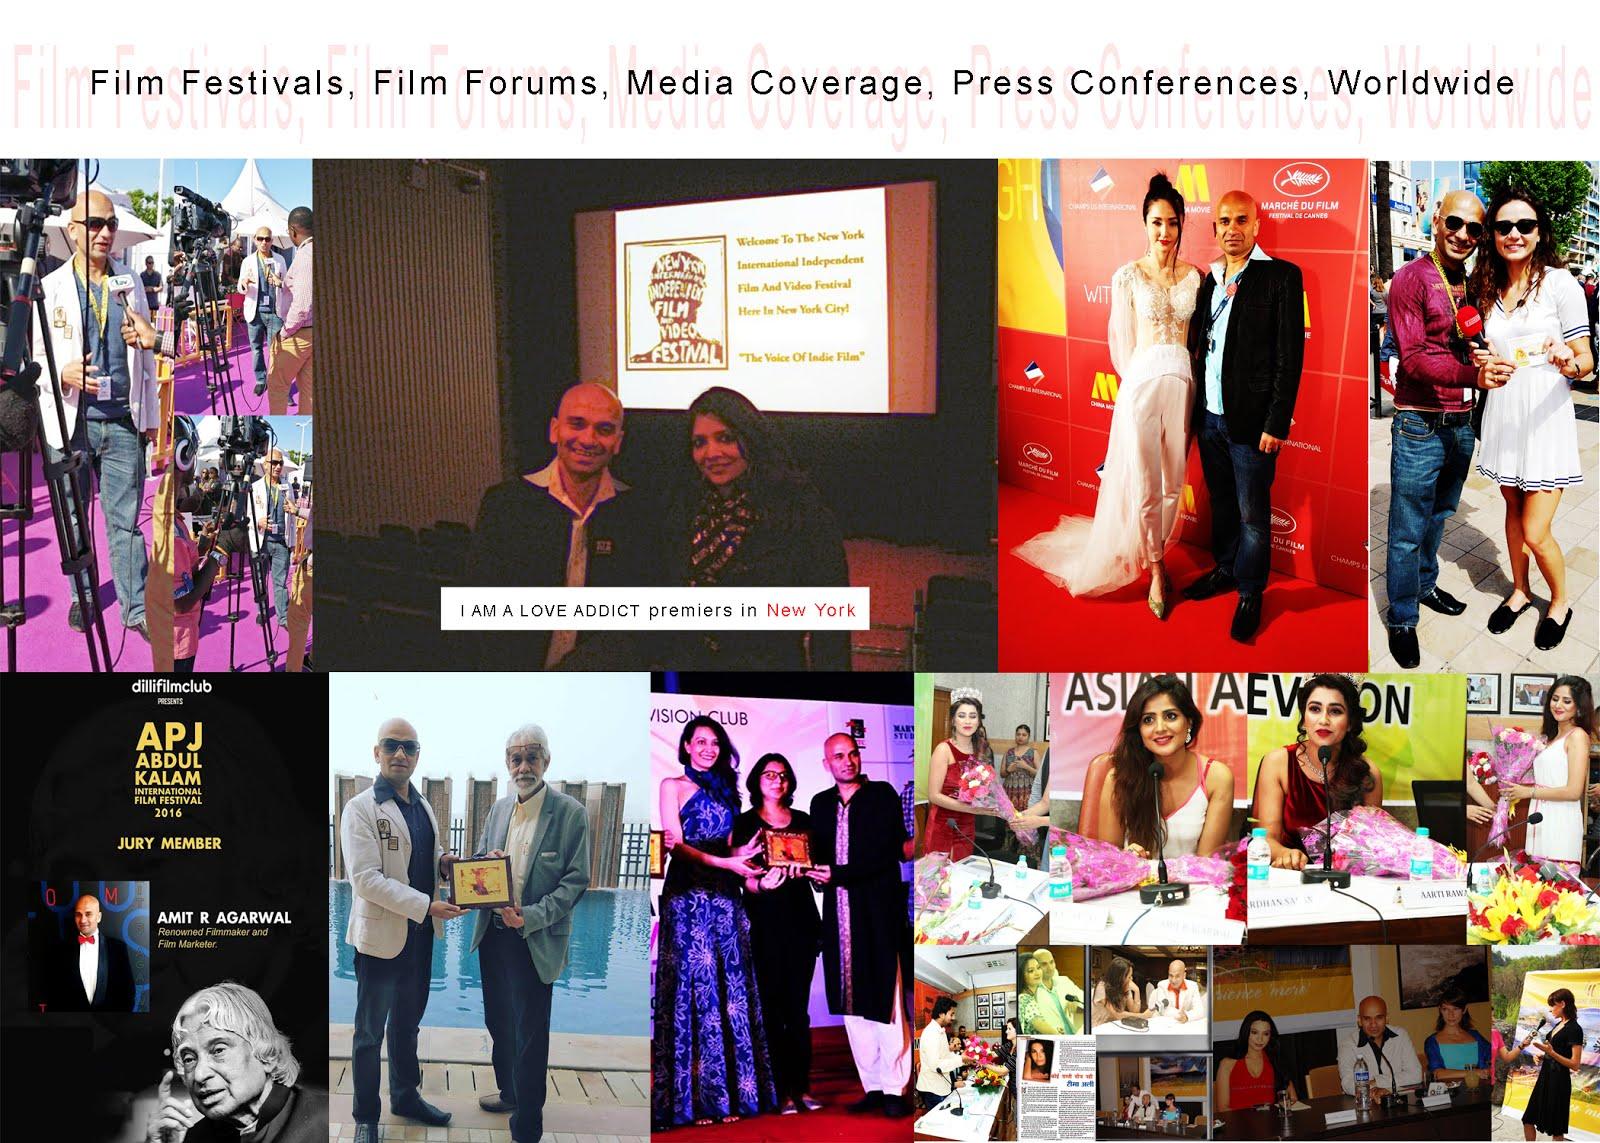 Film Festivals, Film Forums, Media Coverage, Press Conferences, Worldwide